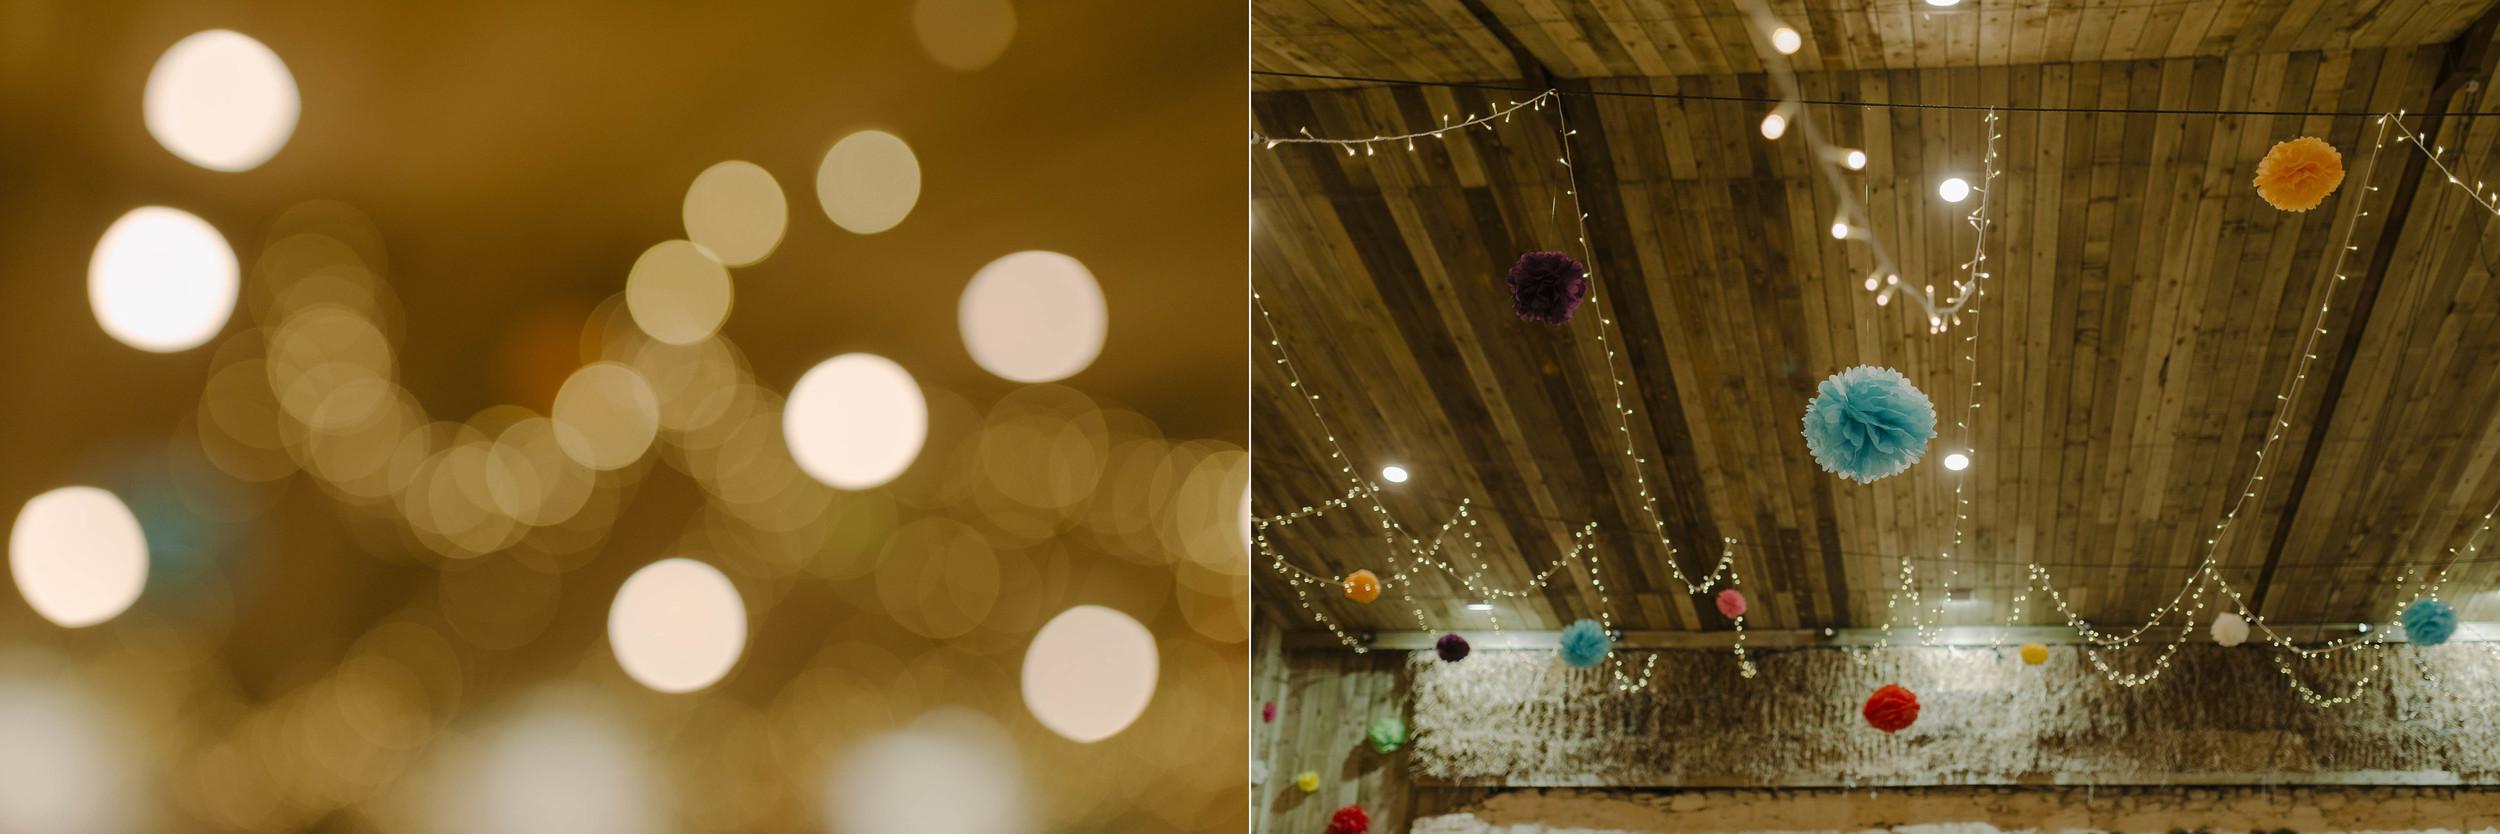 Comrie Croft Wedding Photography 43.jpg